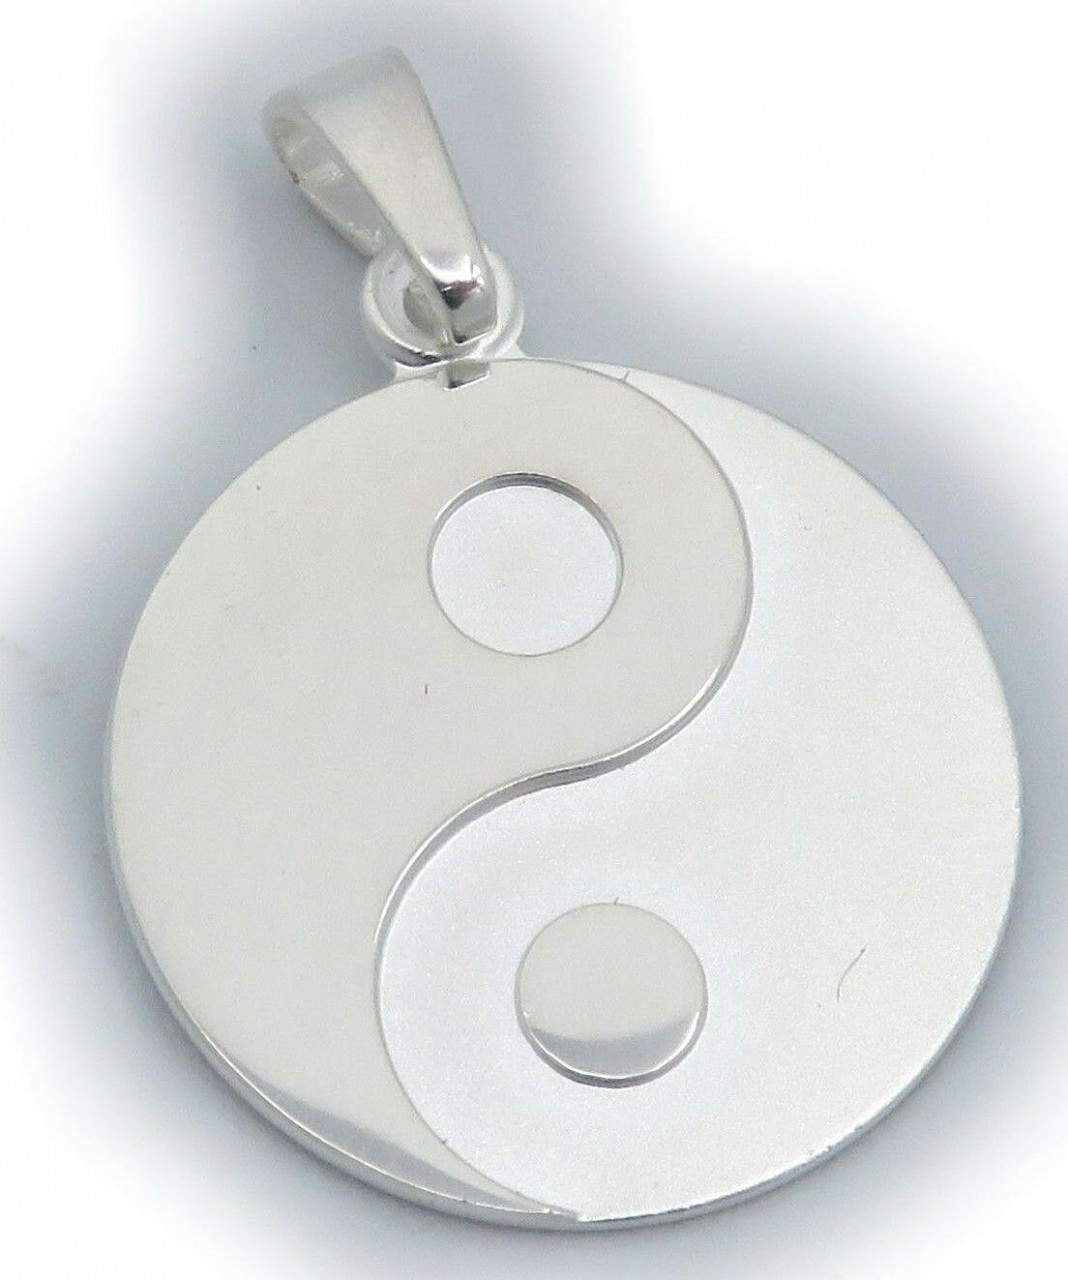 Anhänger Yin Yang echt Silber 925 Ying Yang teilmatt Sterlingsilber